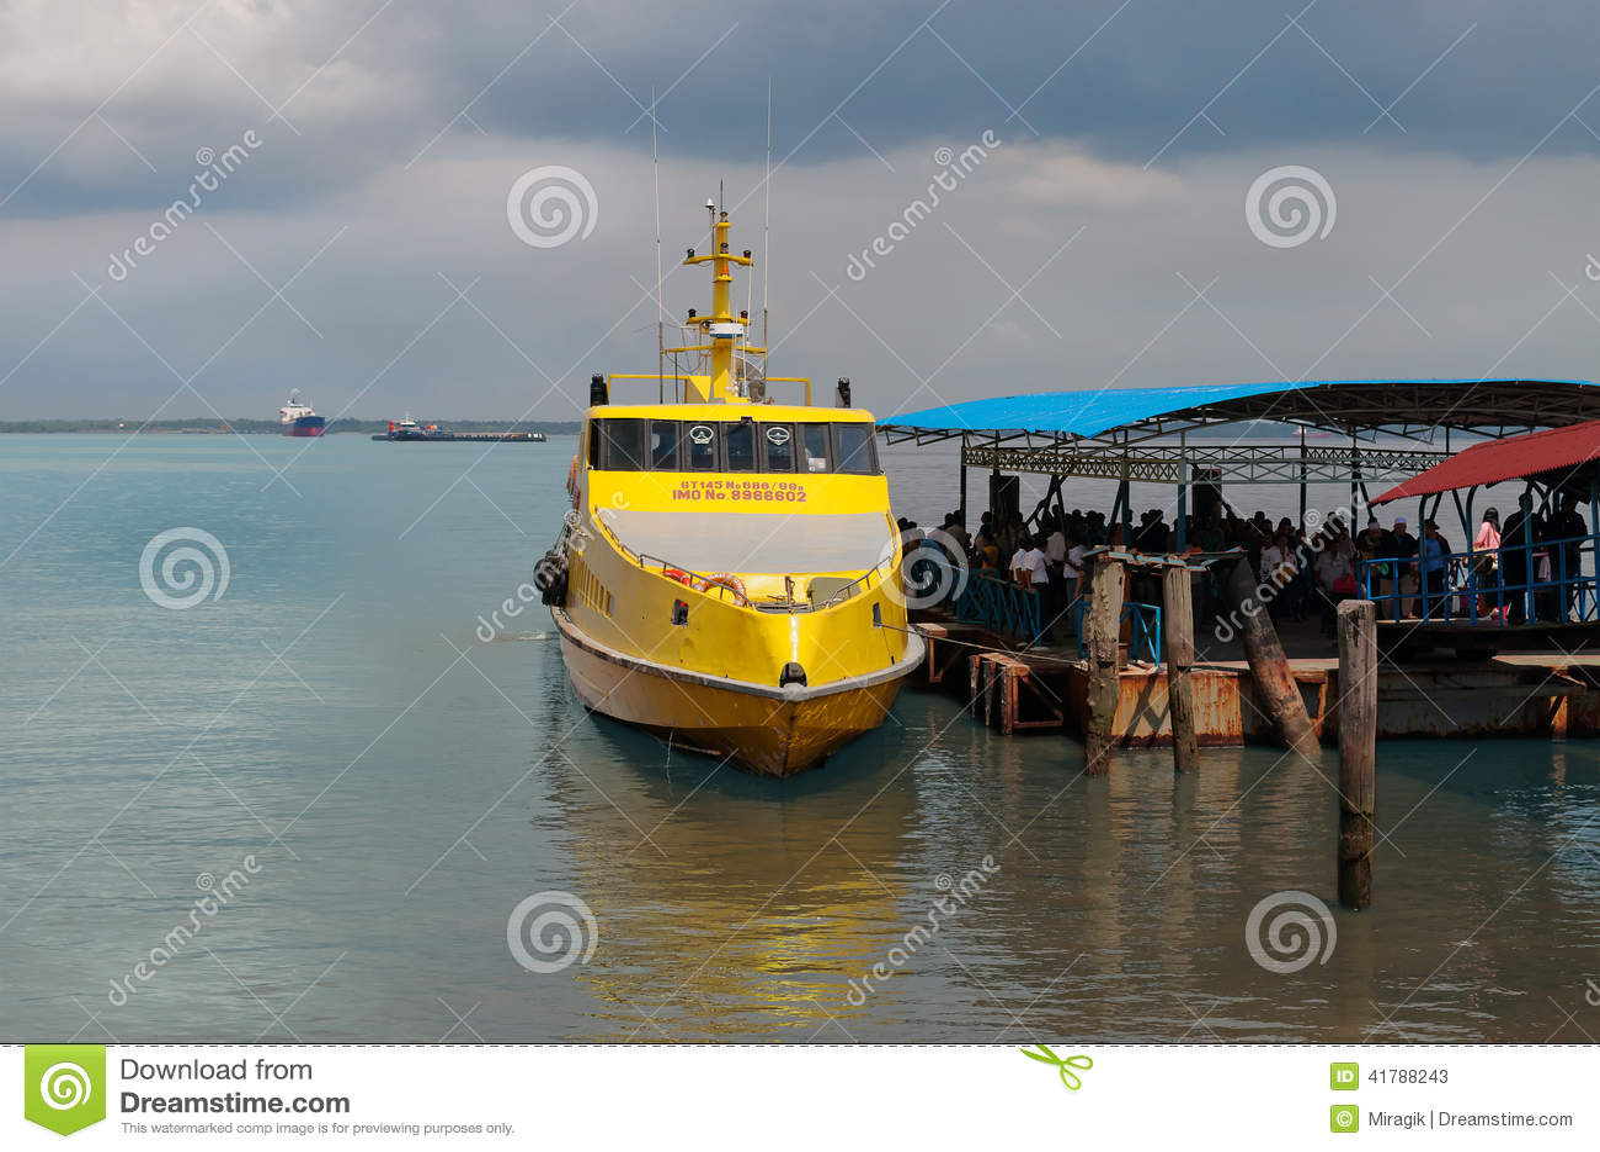 Dumai Indonesia  city photos gallery : DUMAI, INDONESIA DEC 21, 2013: Ferry Melaka Dumai in Dumai Port ...